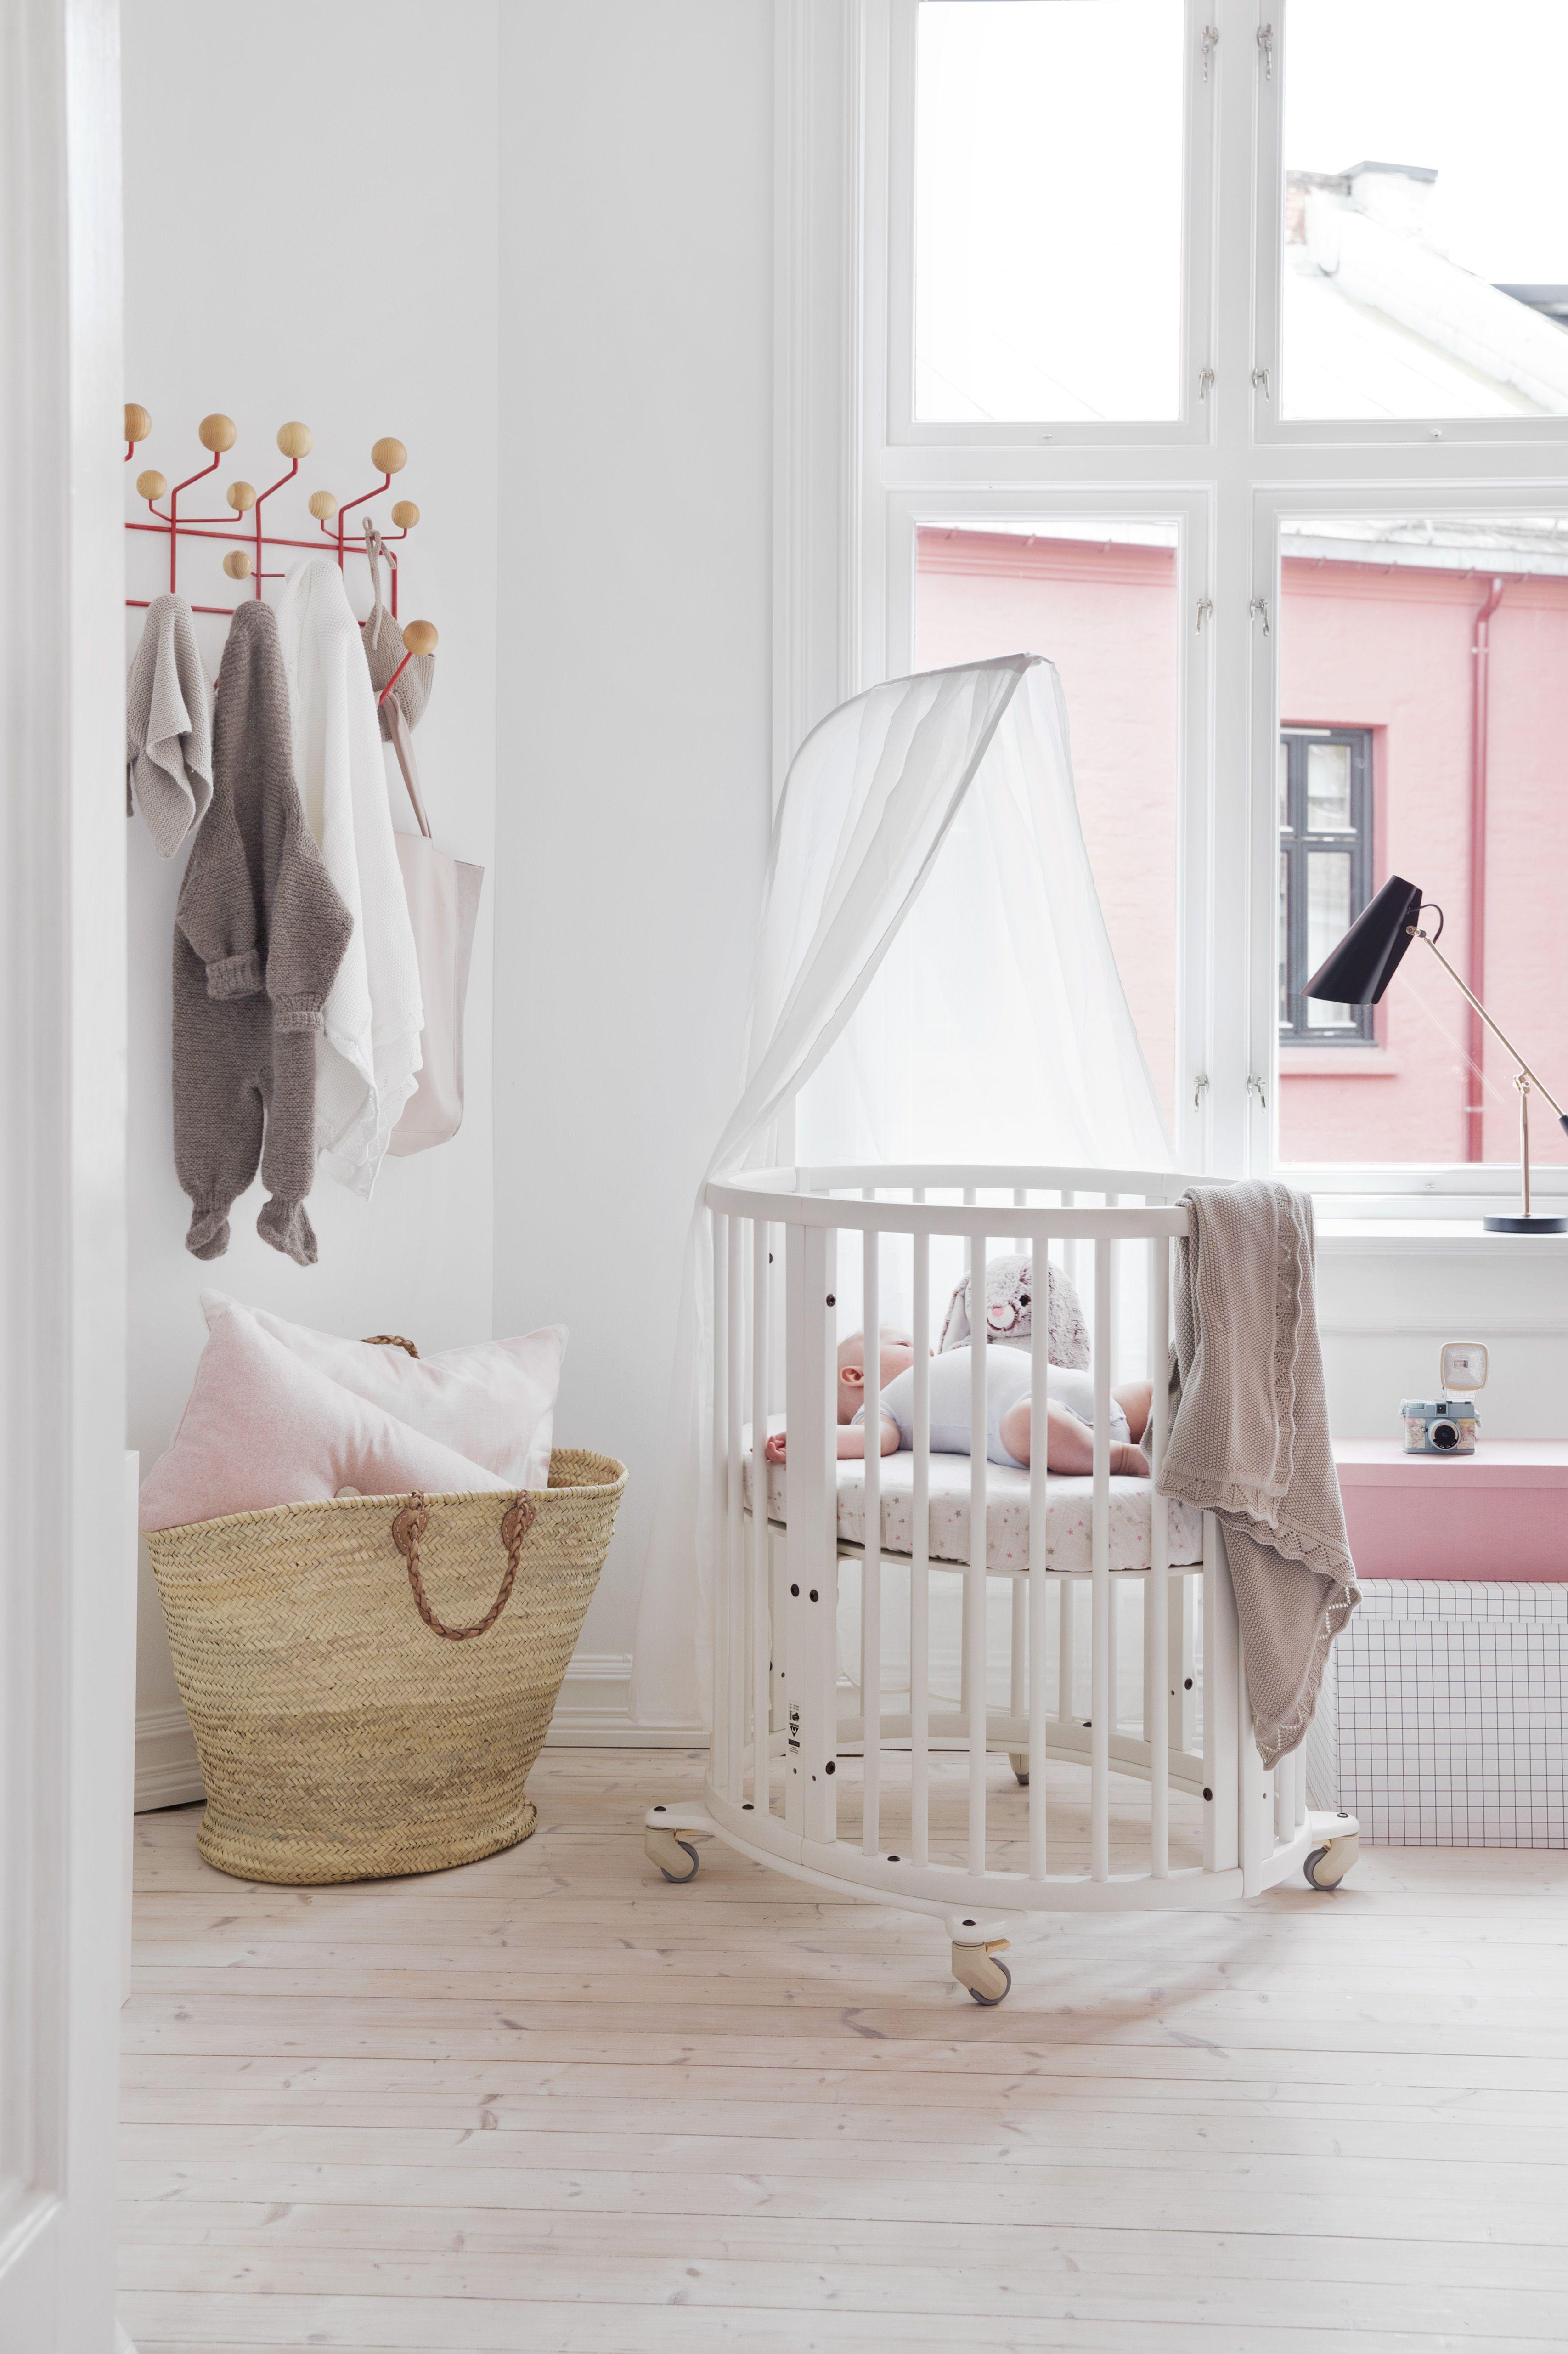 Make A Dreamy Nursery Space A Reality With Stokke Sleepi Mini Crib Baby Cribs Cribs Baby Decor